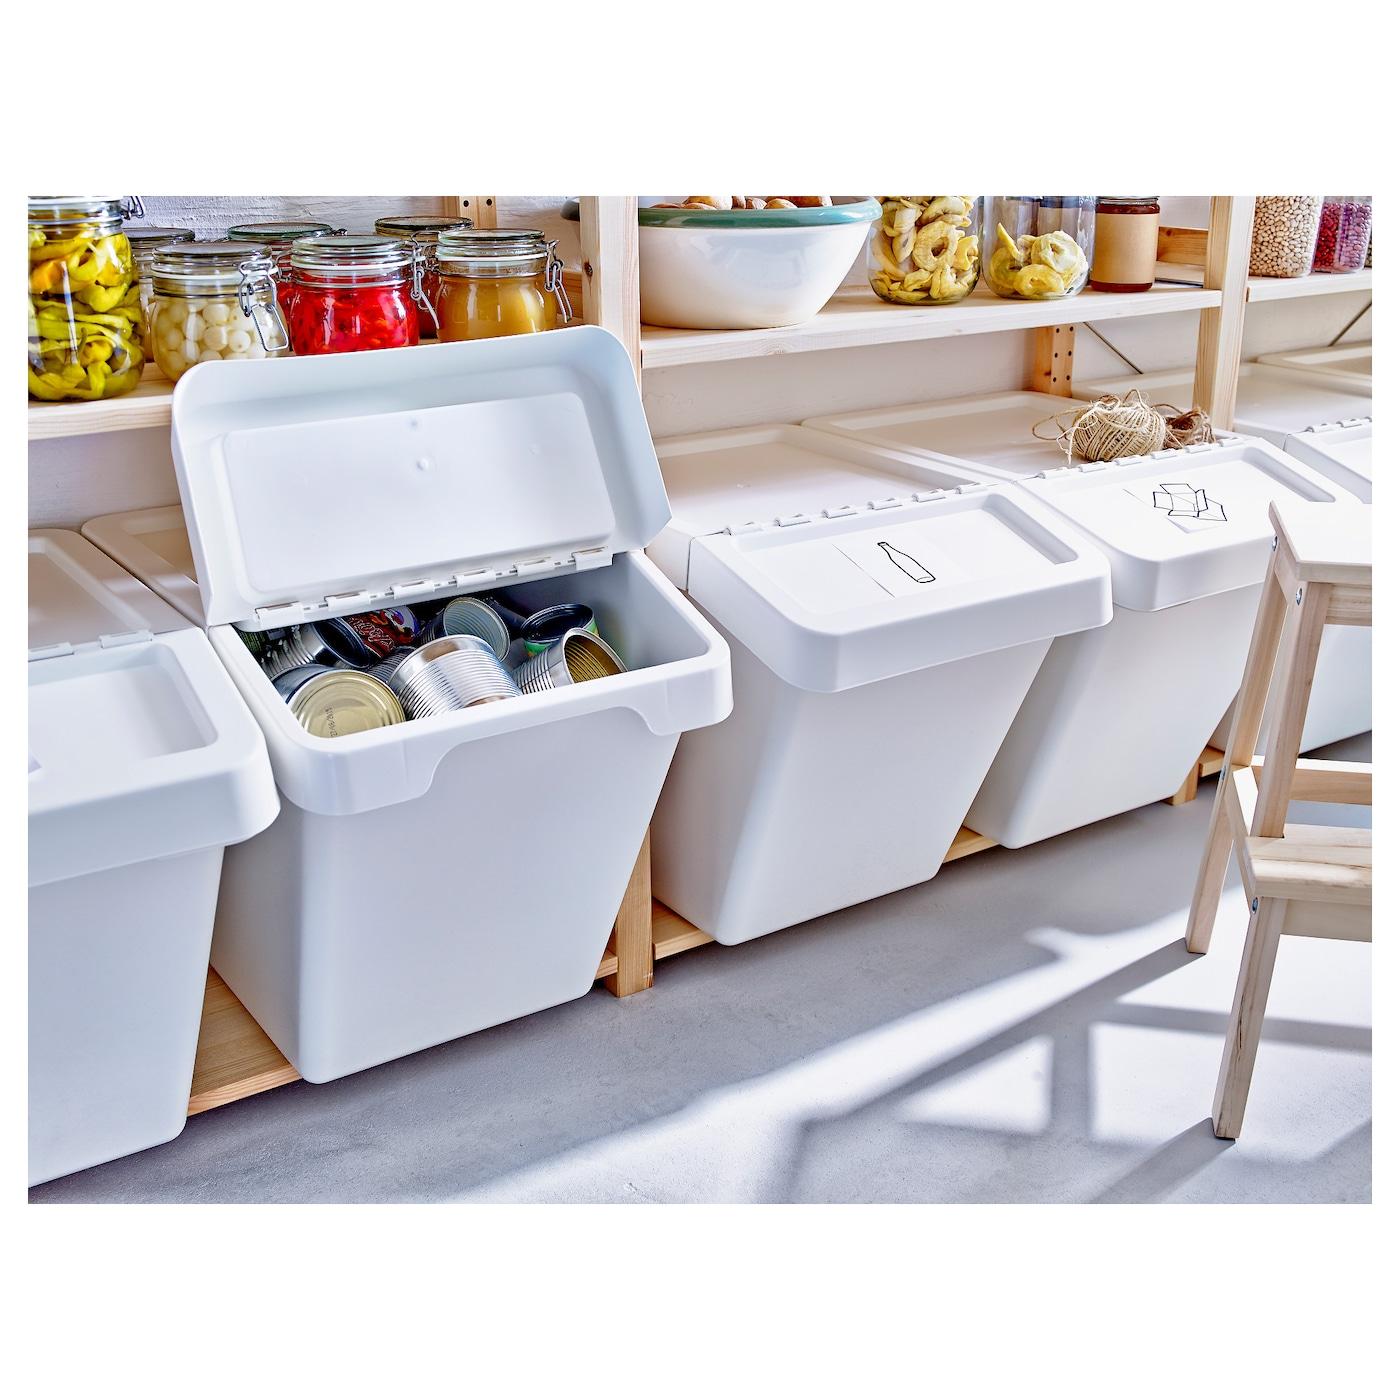 SORTERA Recycling bin with lid, white, 16 gallon Ikea classroom